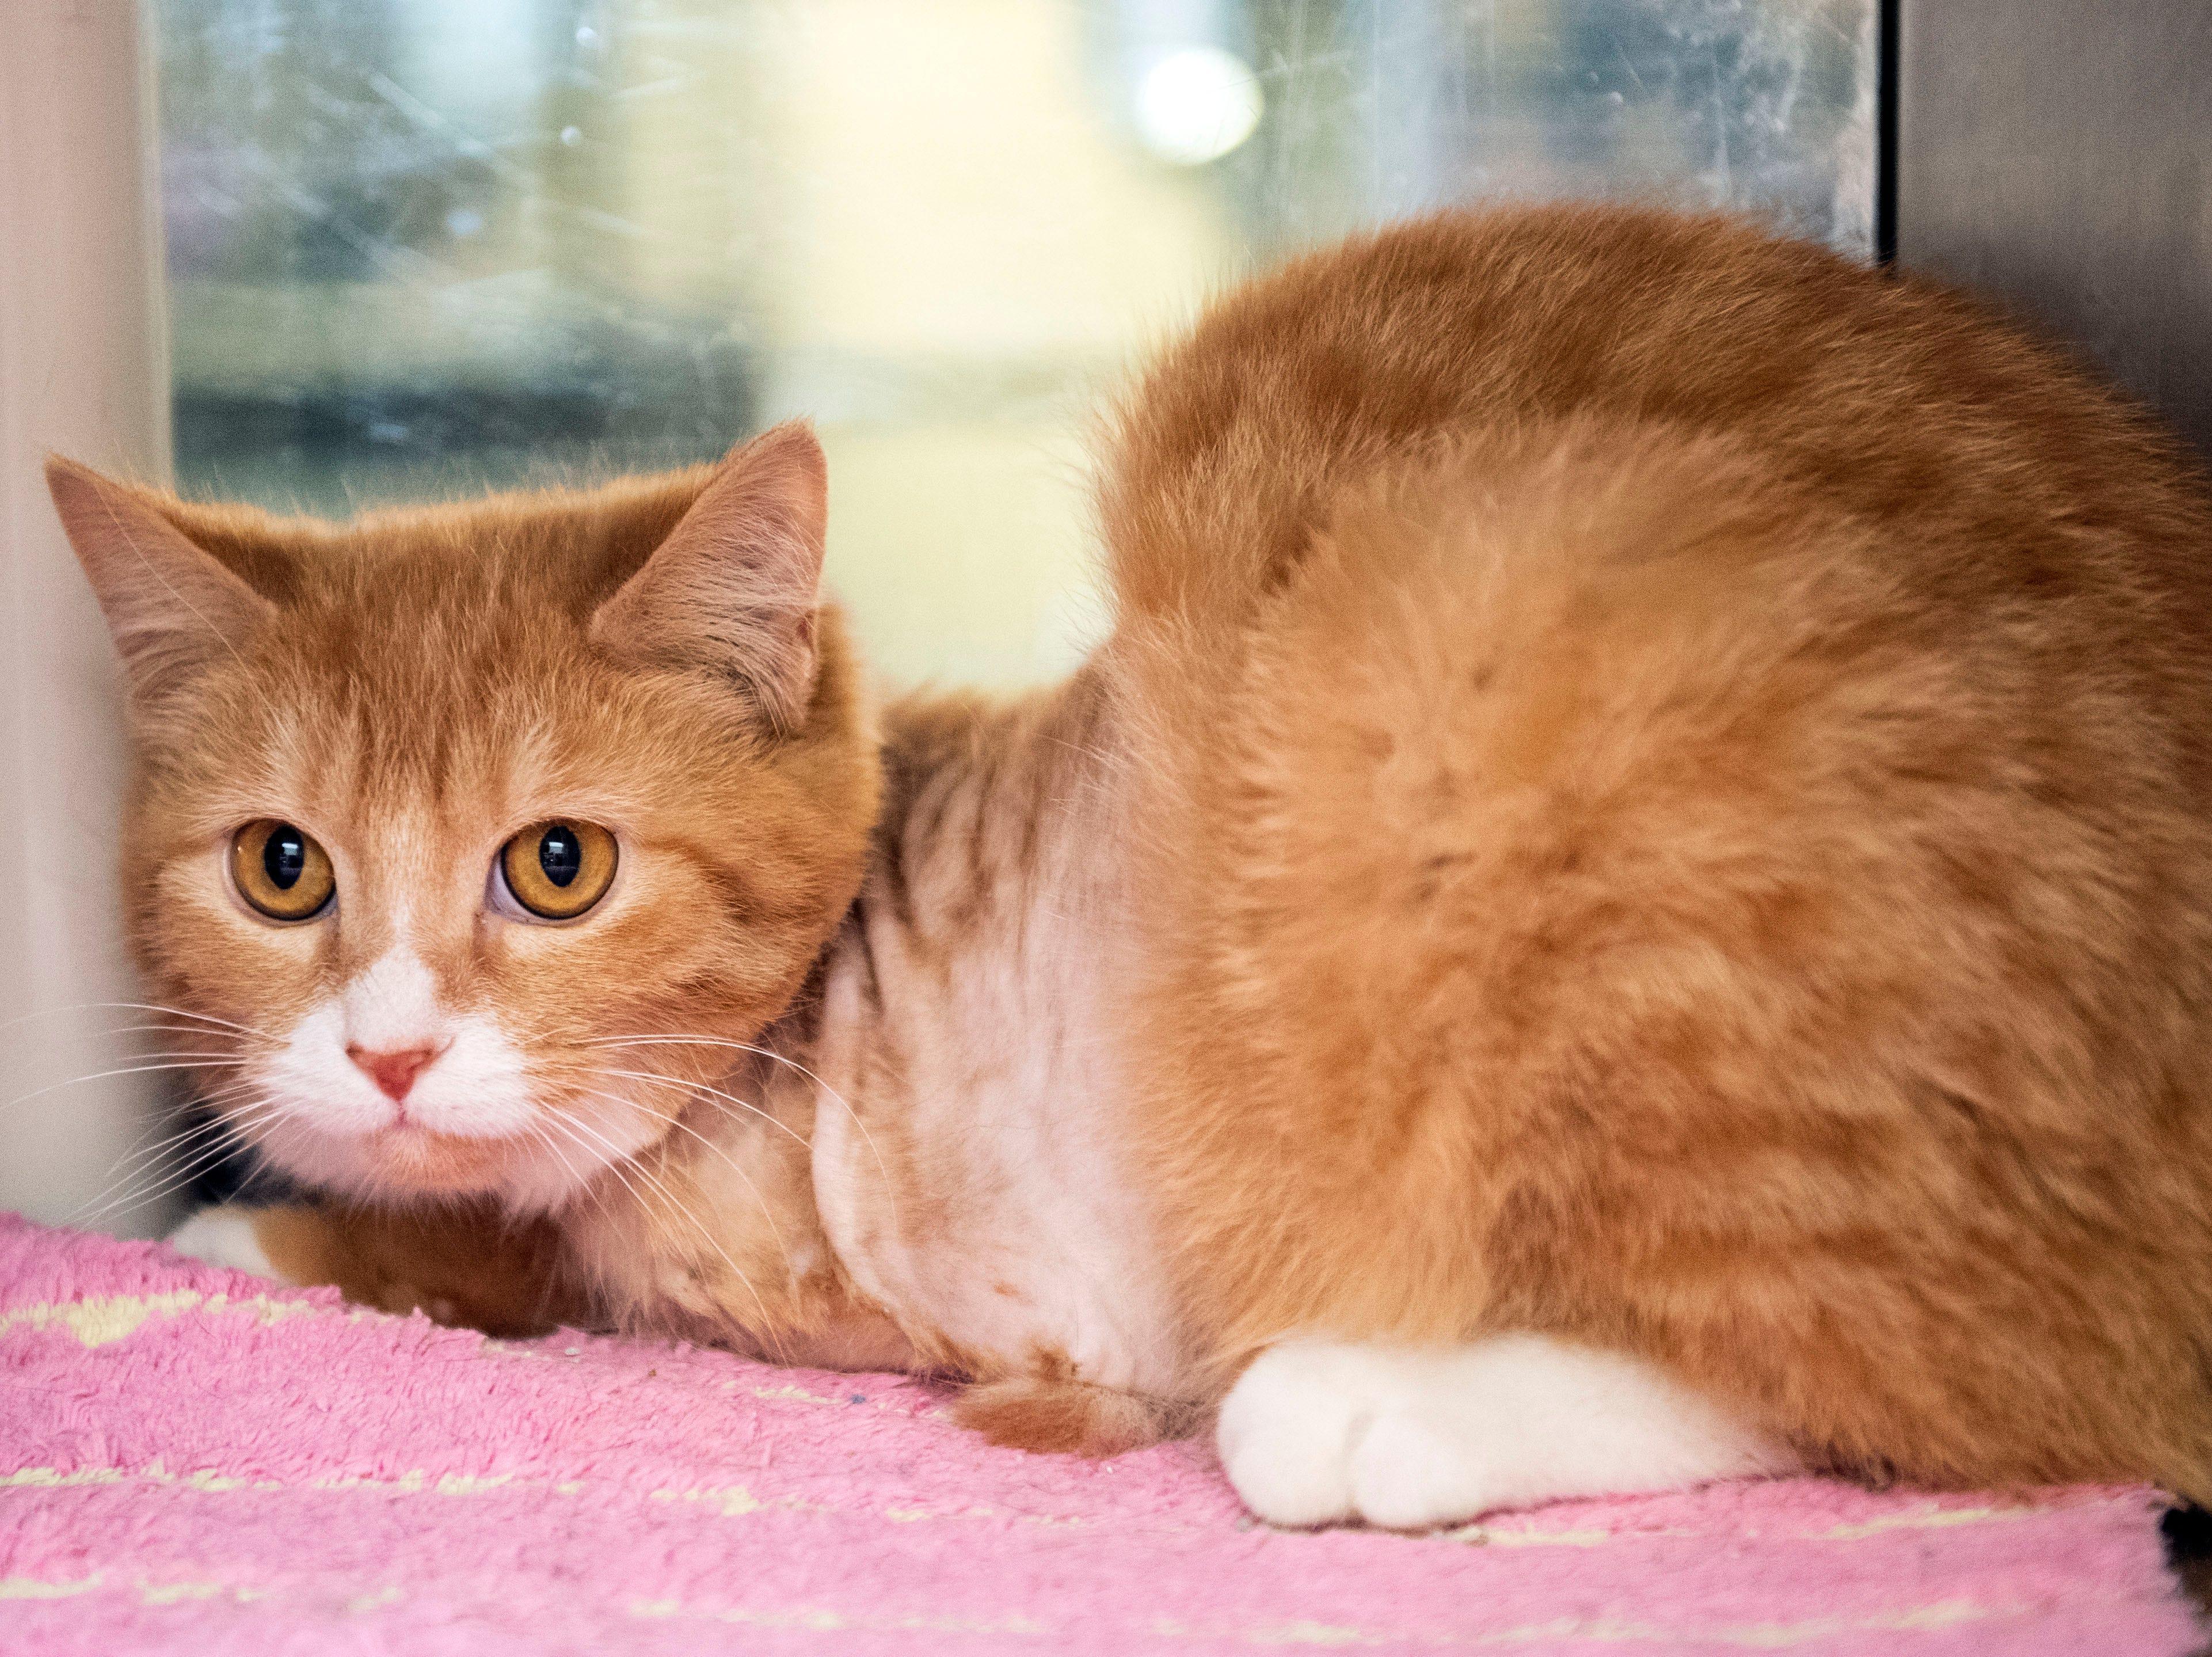 Darryl, a three-legged cat at the York County SPCA, Thursday, Feb. 7, 2019. Darryl was found in Codorus Township.